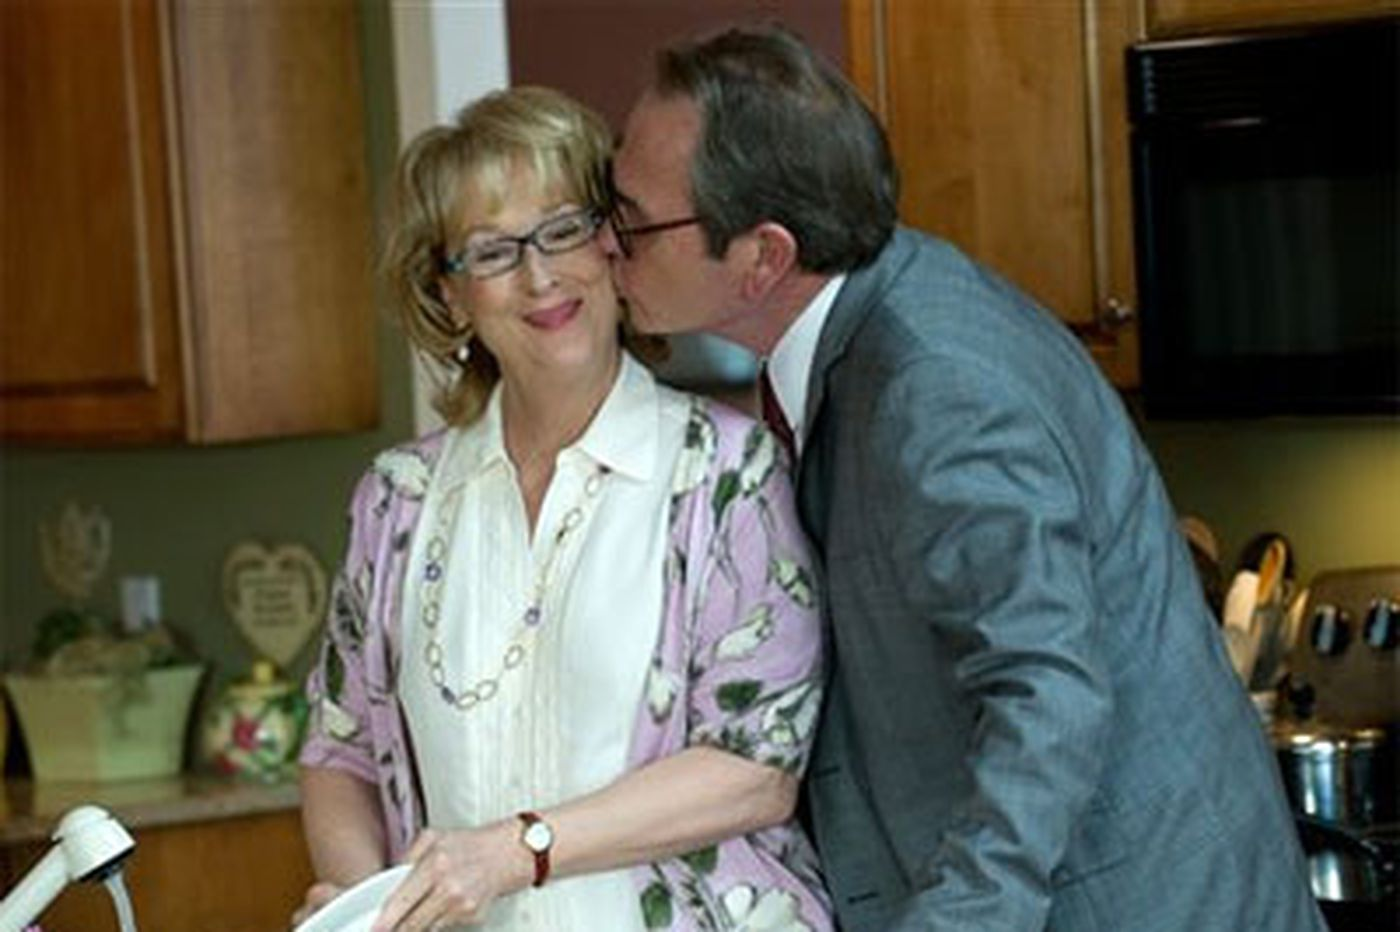 'Hope Springs': Few laughs in Streep, Jones romcom